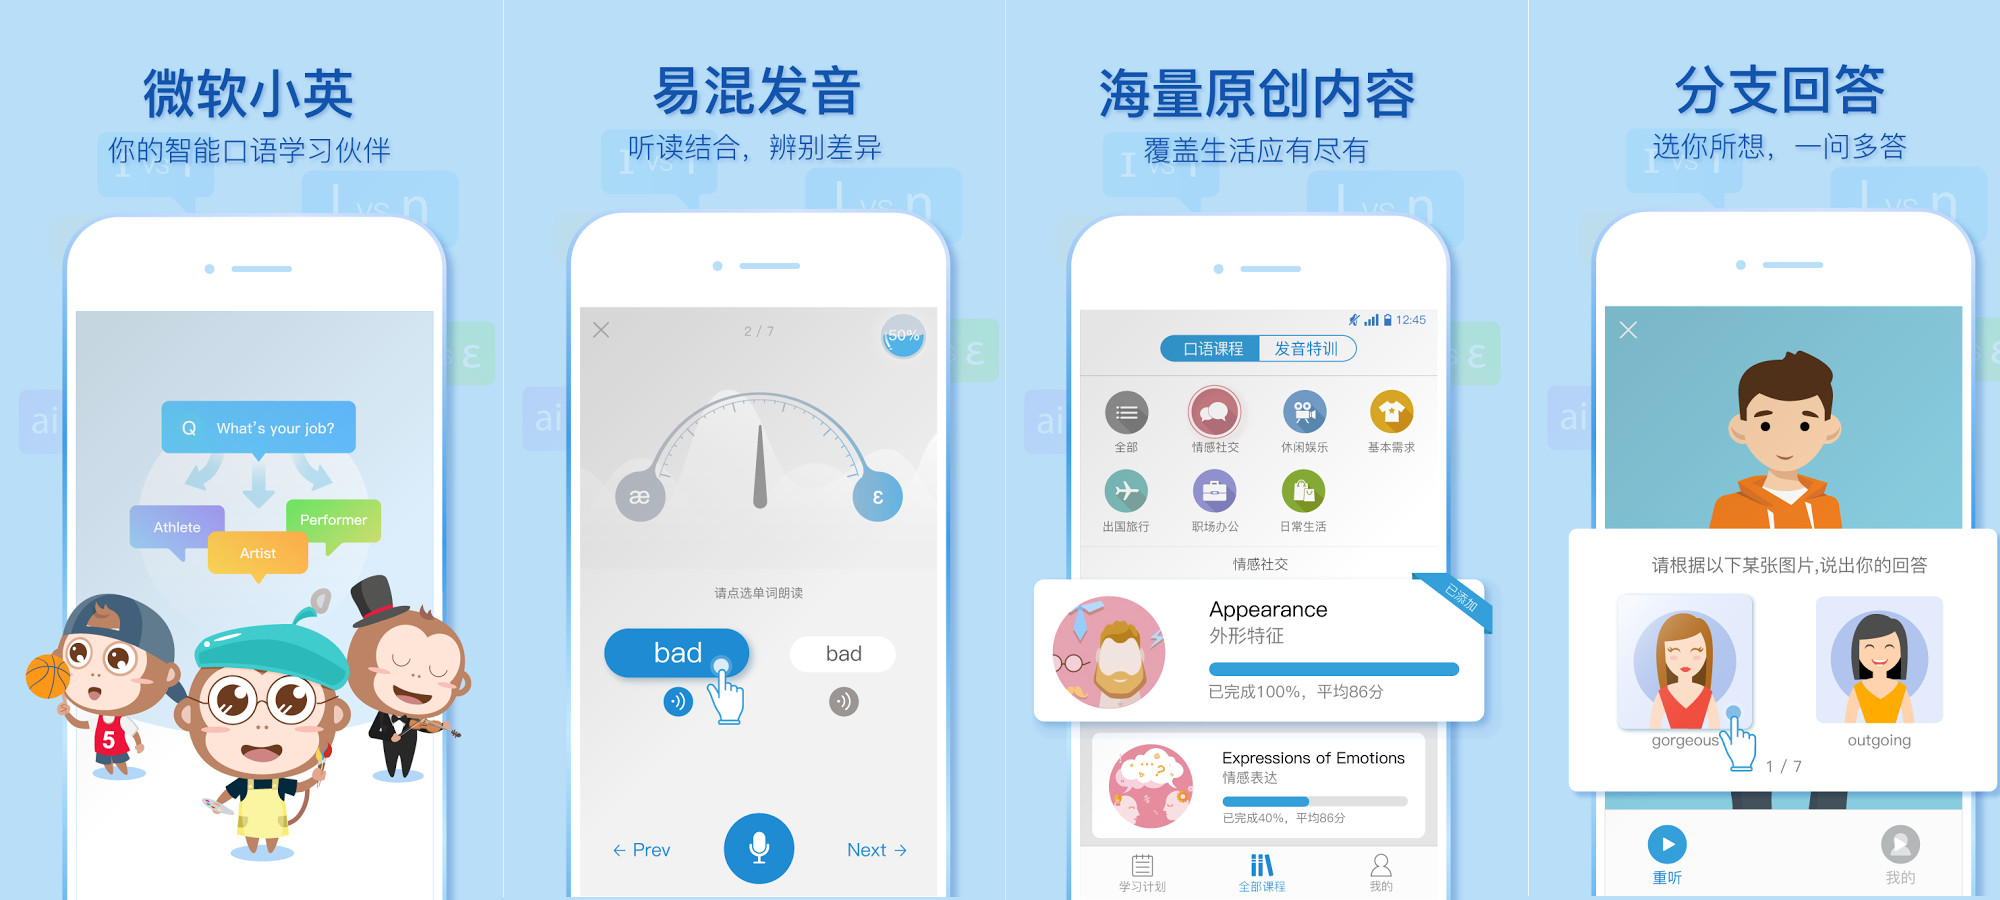 Microsoft's Engkoo app aims to improve English pronunciation